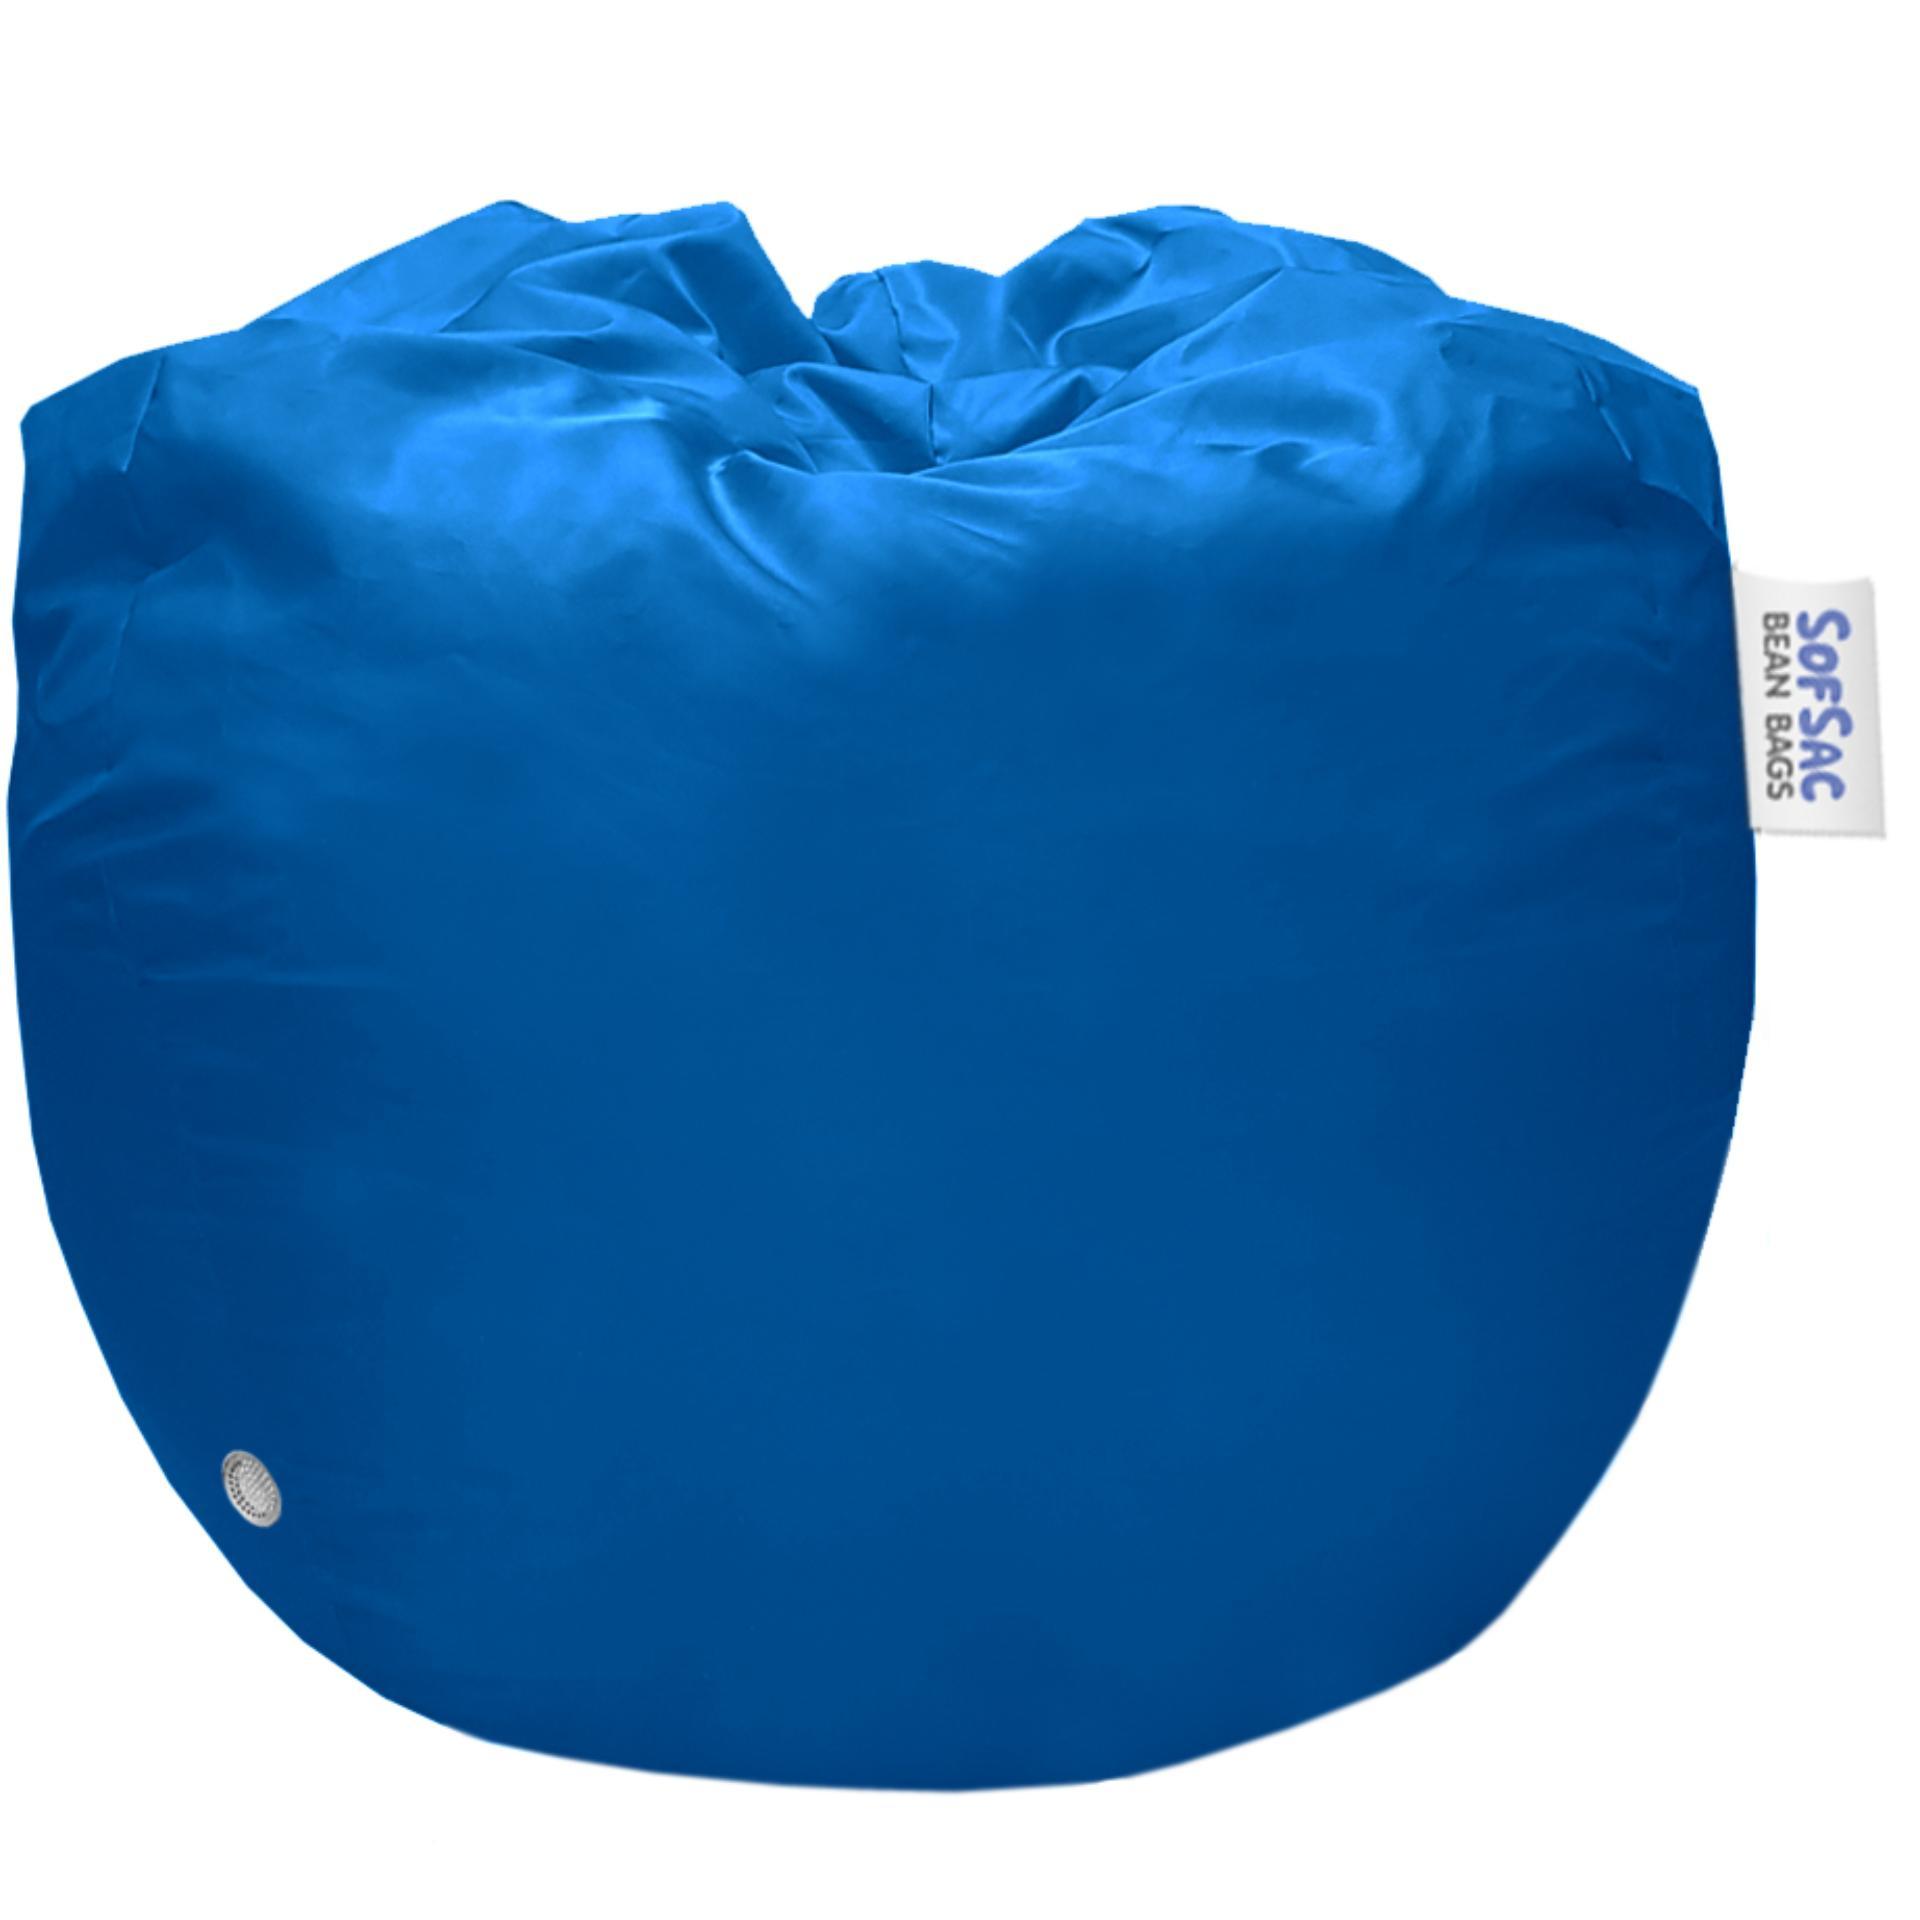 f879881654 Bean Bag Chairs for sale - Bean Bag Chair Furniture prices